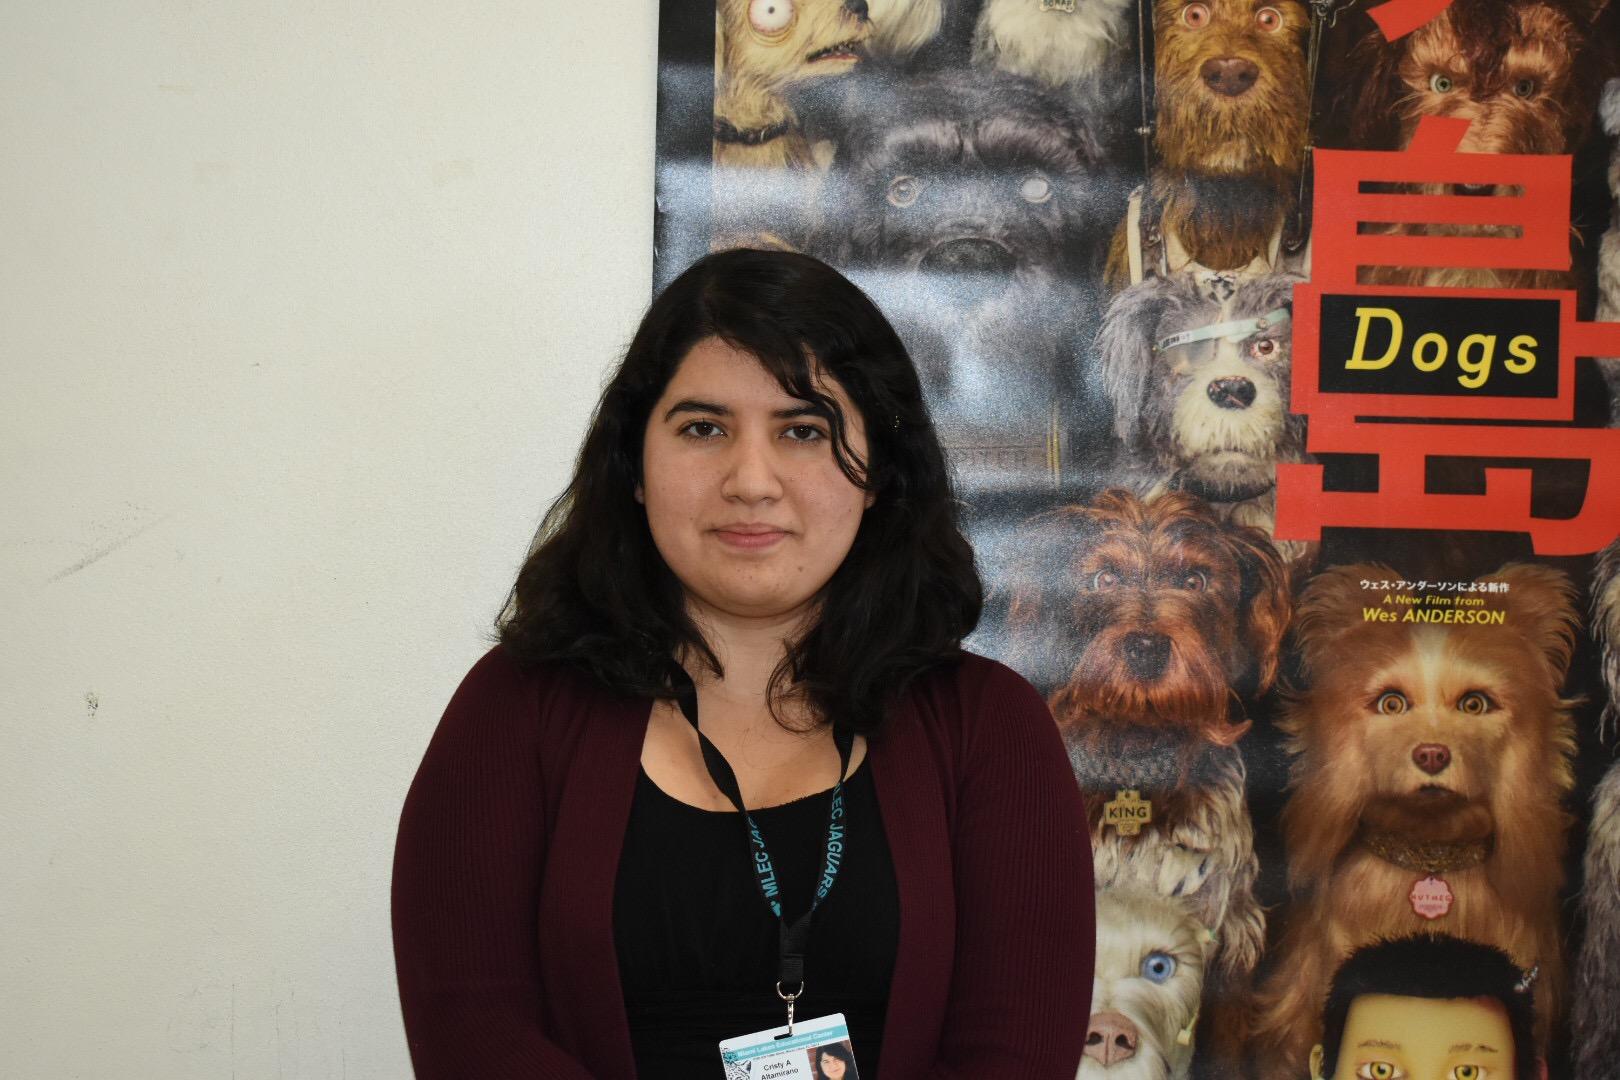 Meet the Newest Jaguar: Ms. Altamirano